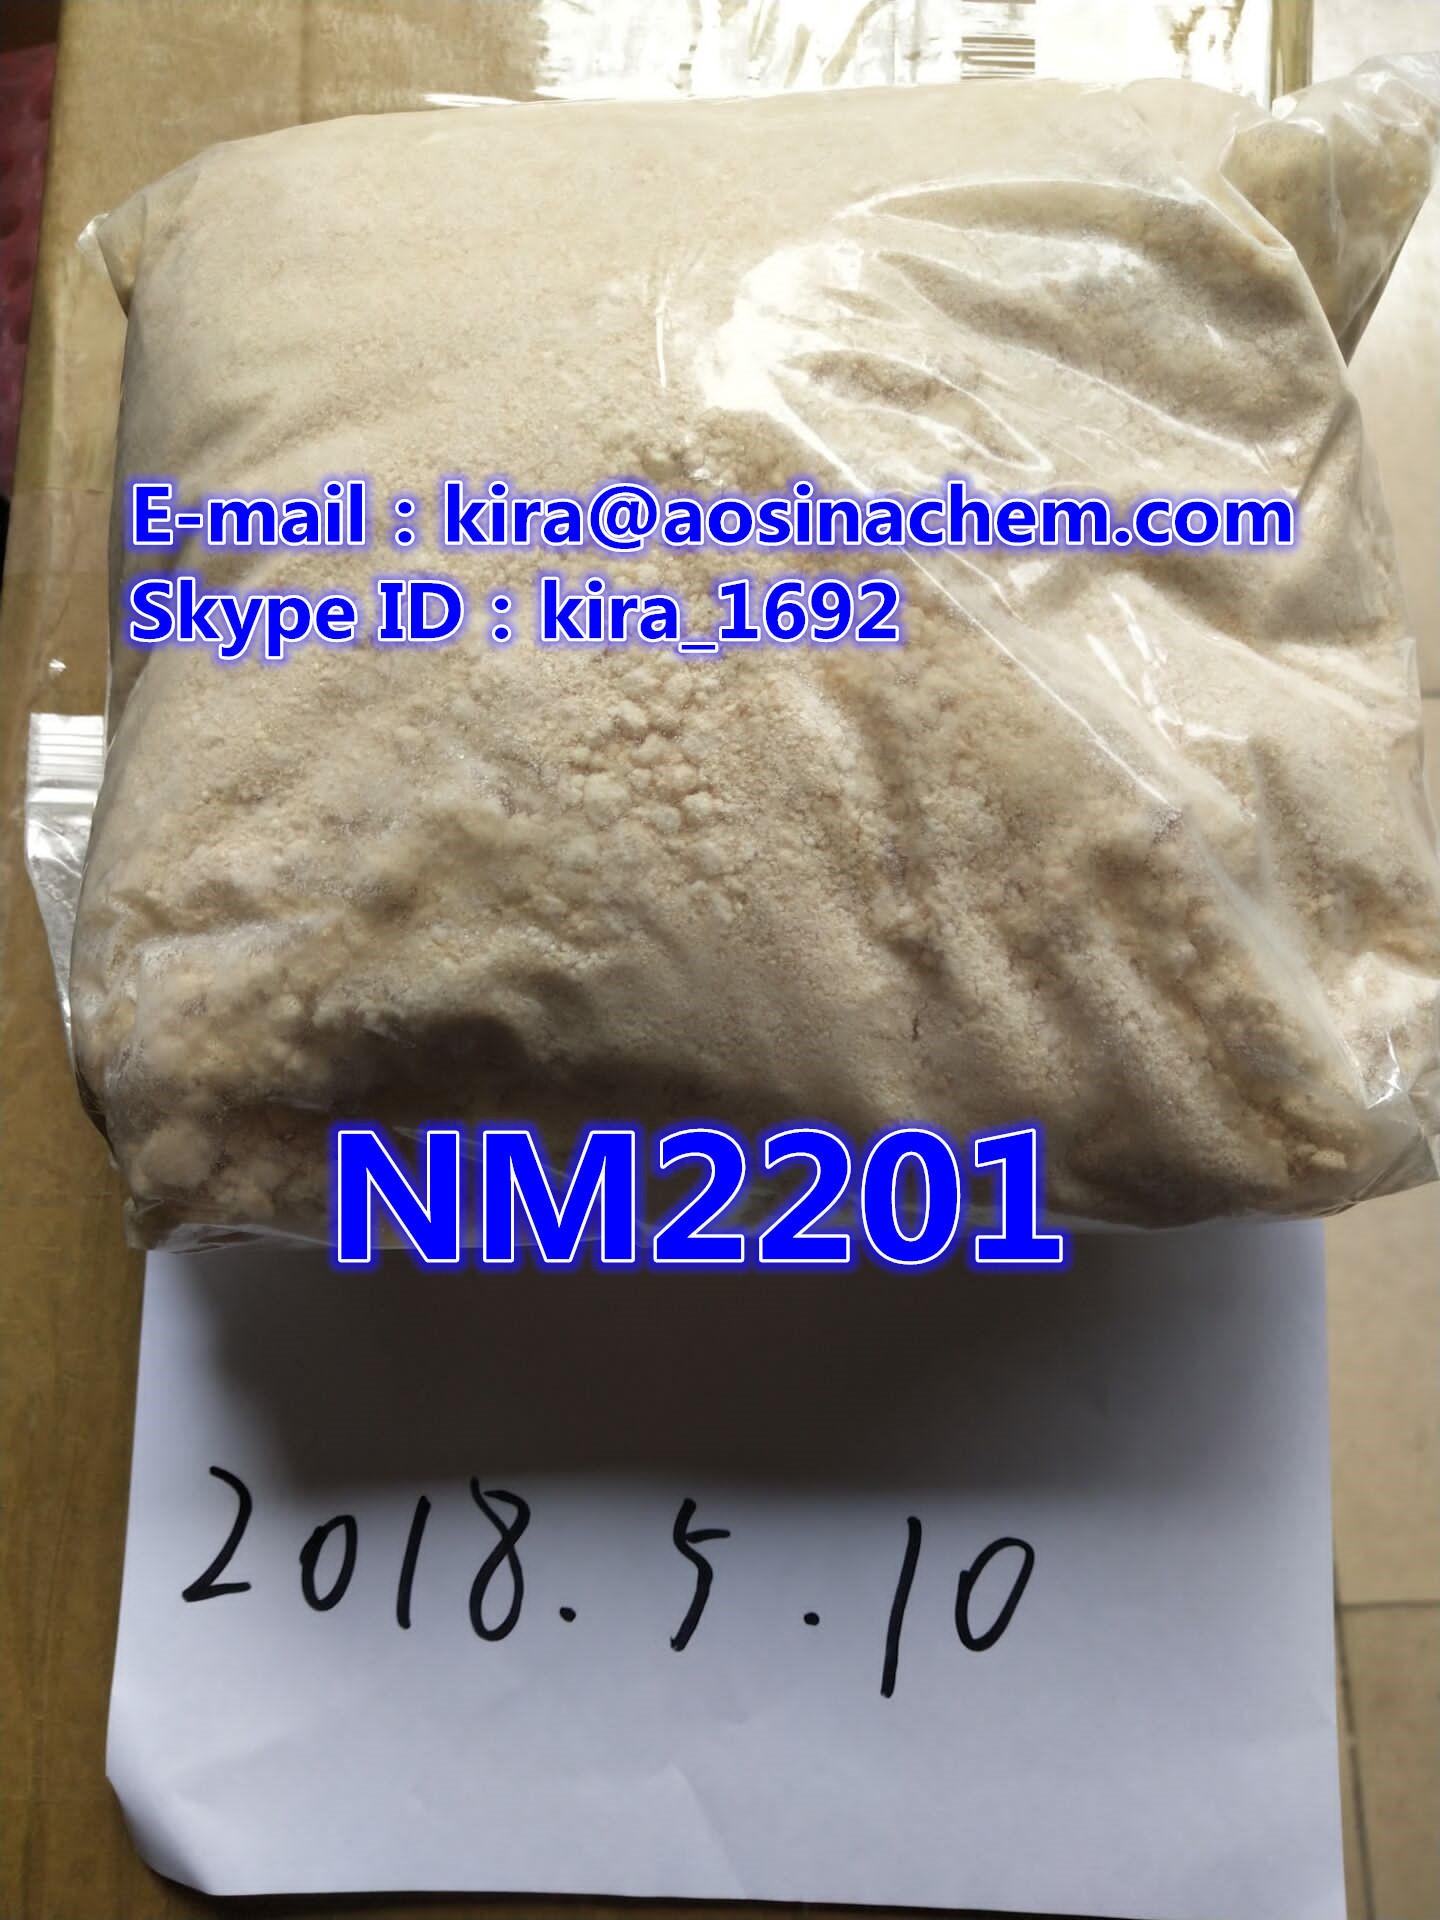 Powder NM2201 nm2201 nm-2201 vendor,kira@aosinachem.com,Skype ID:kira_1692